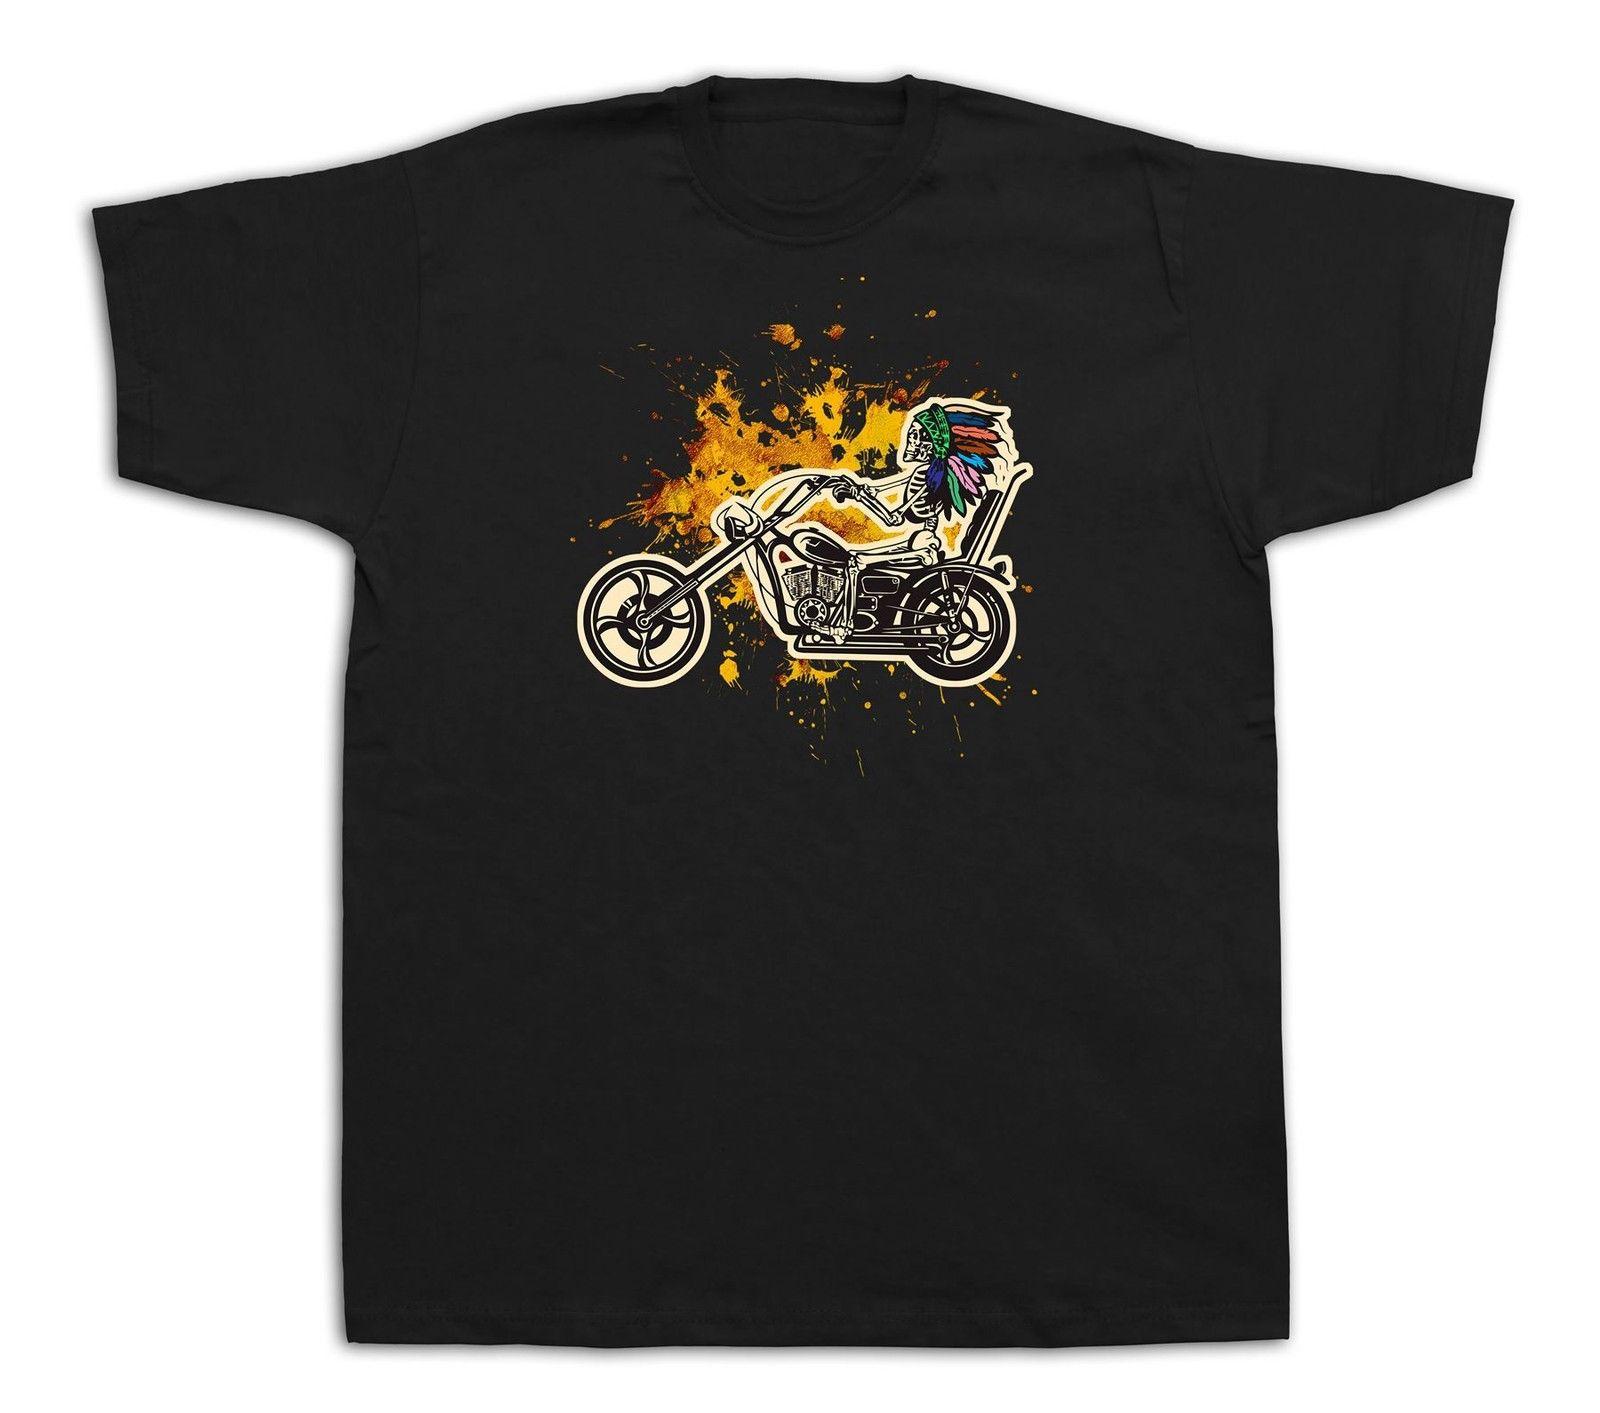 Native Skeleton Indian Motorcyle Chief Headdress Shirt 100% cotton